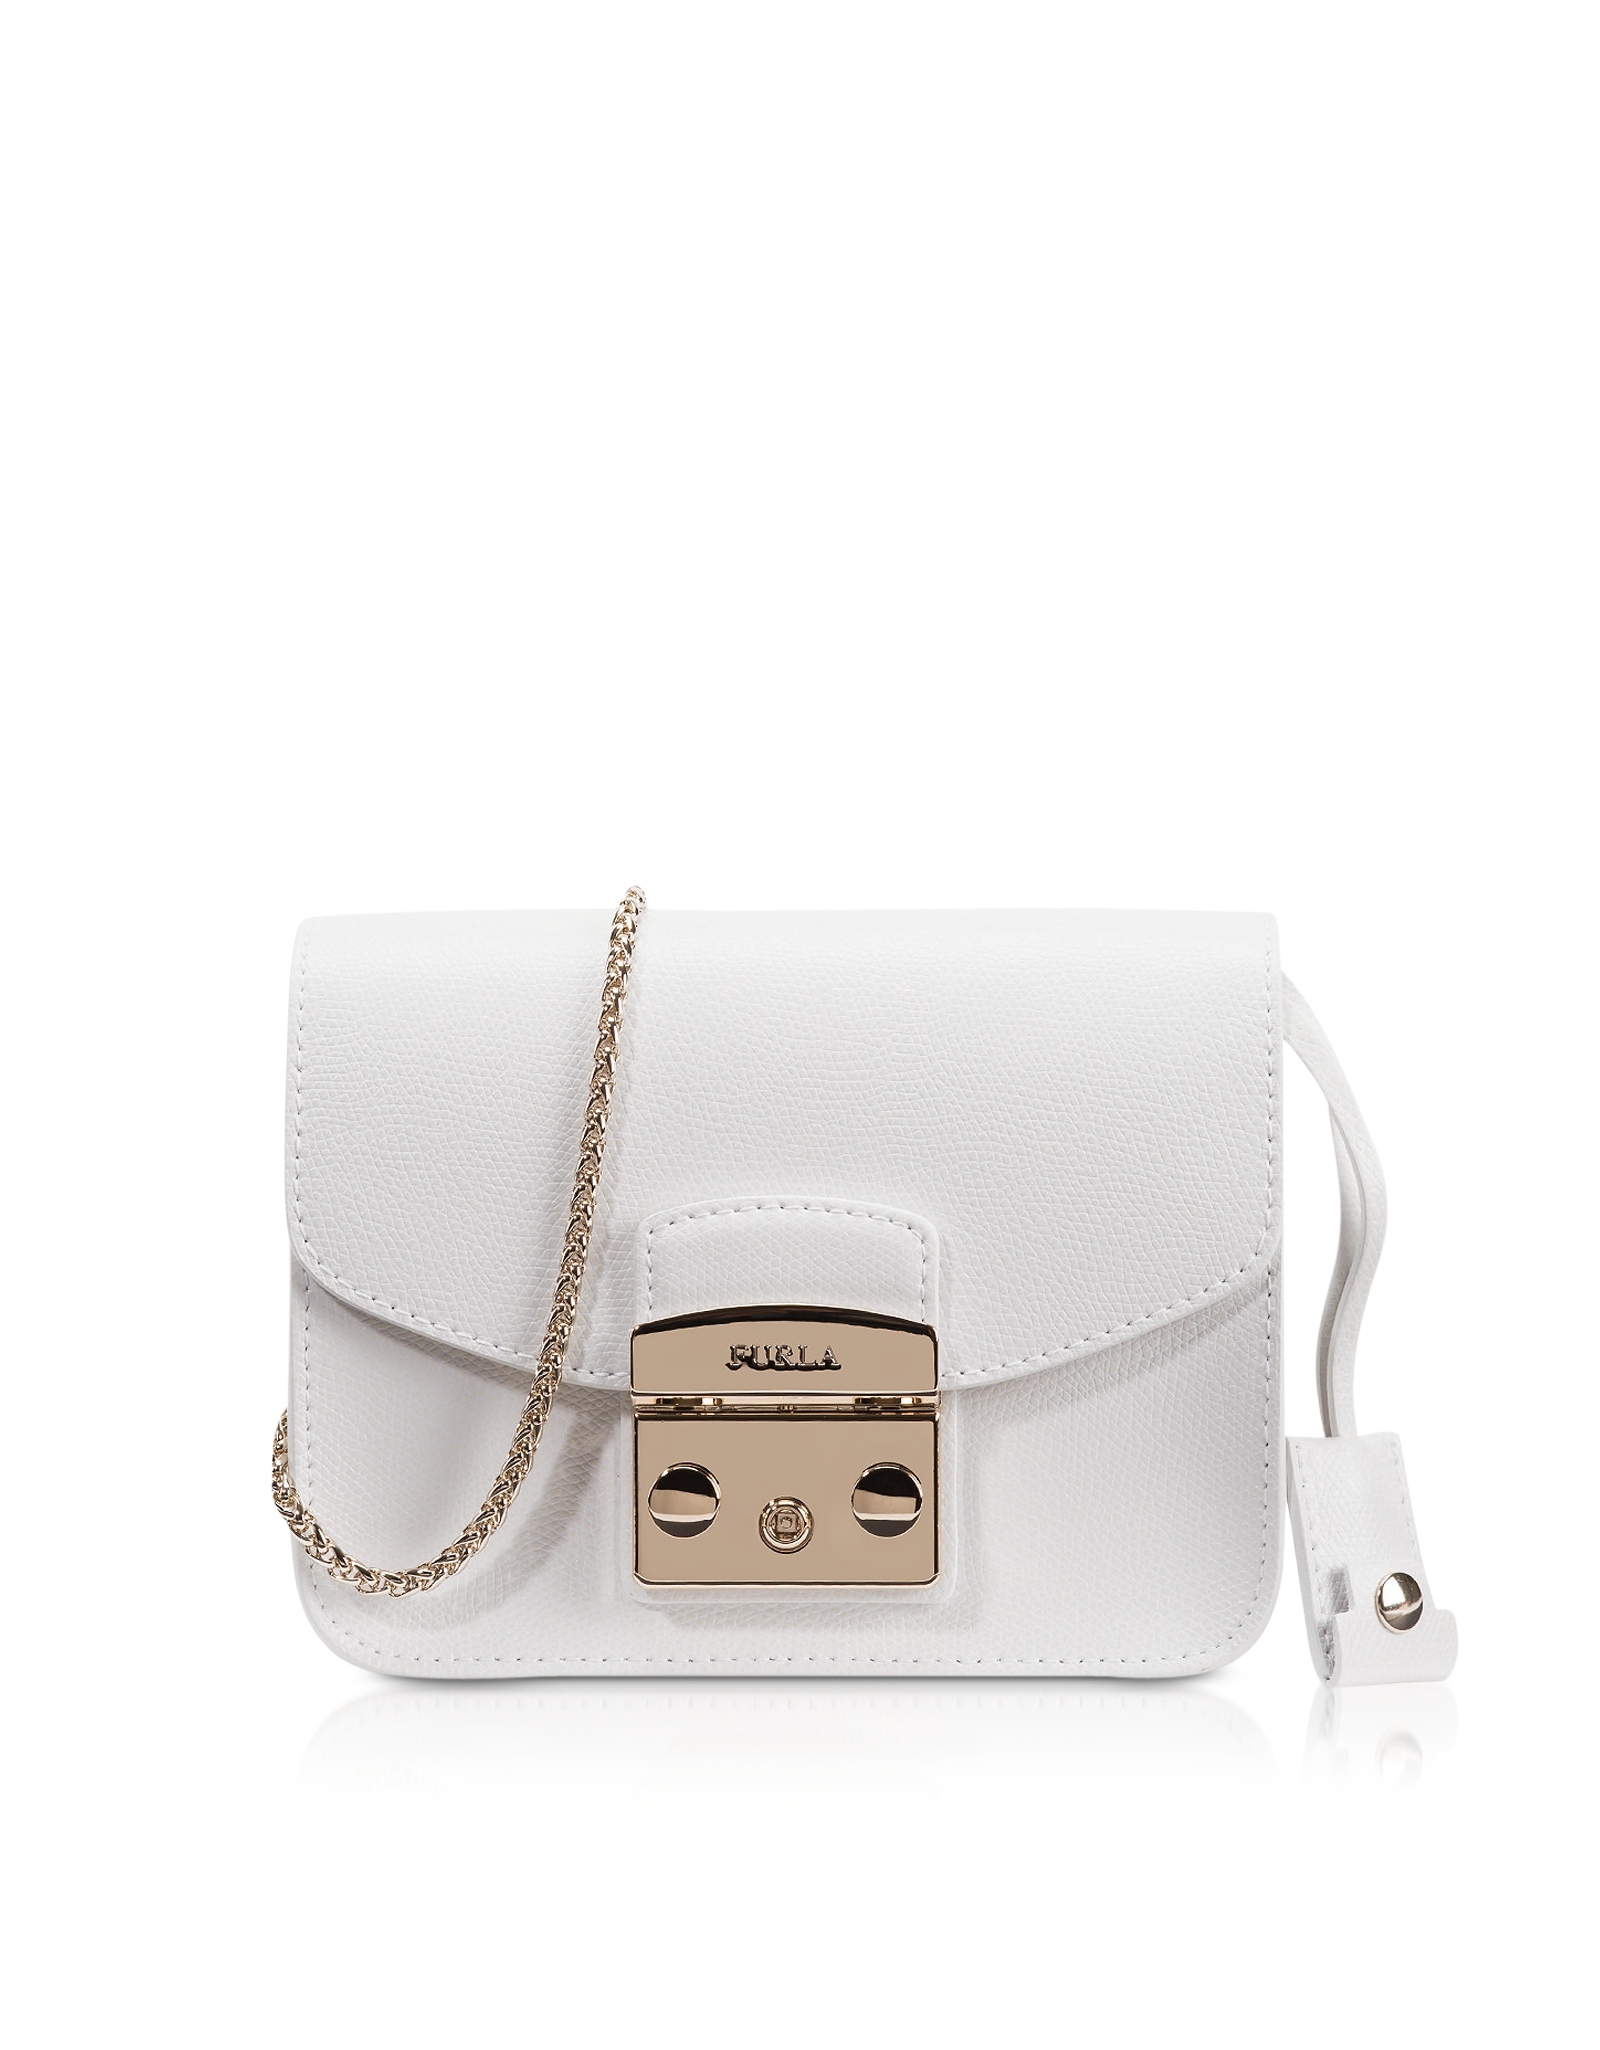 Lyst Furla Metropolis Chalk Leather Mini Crossbody Bag In White e702f8f5b9fe9